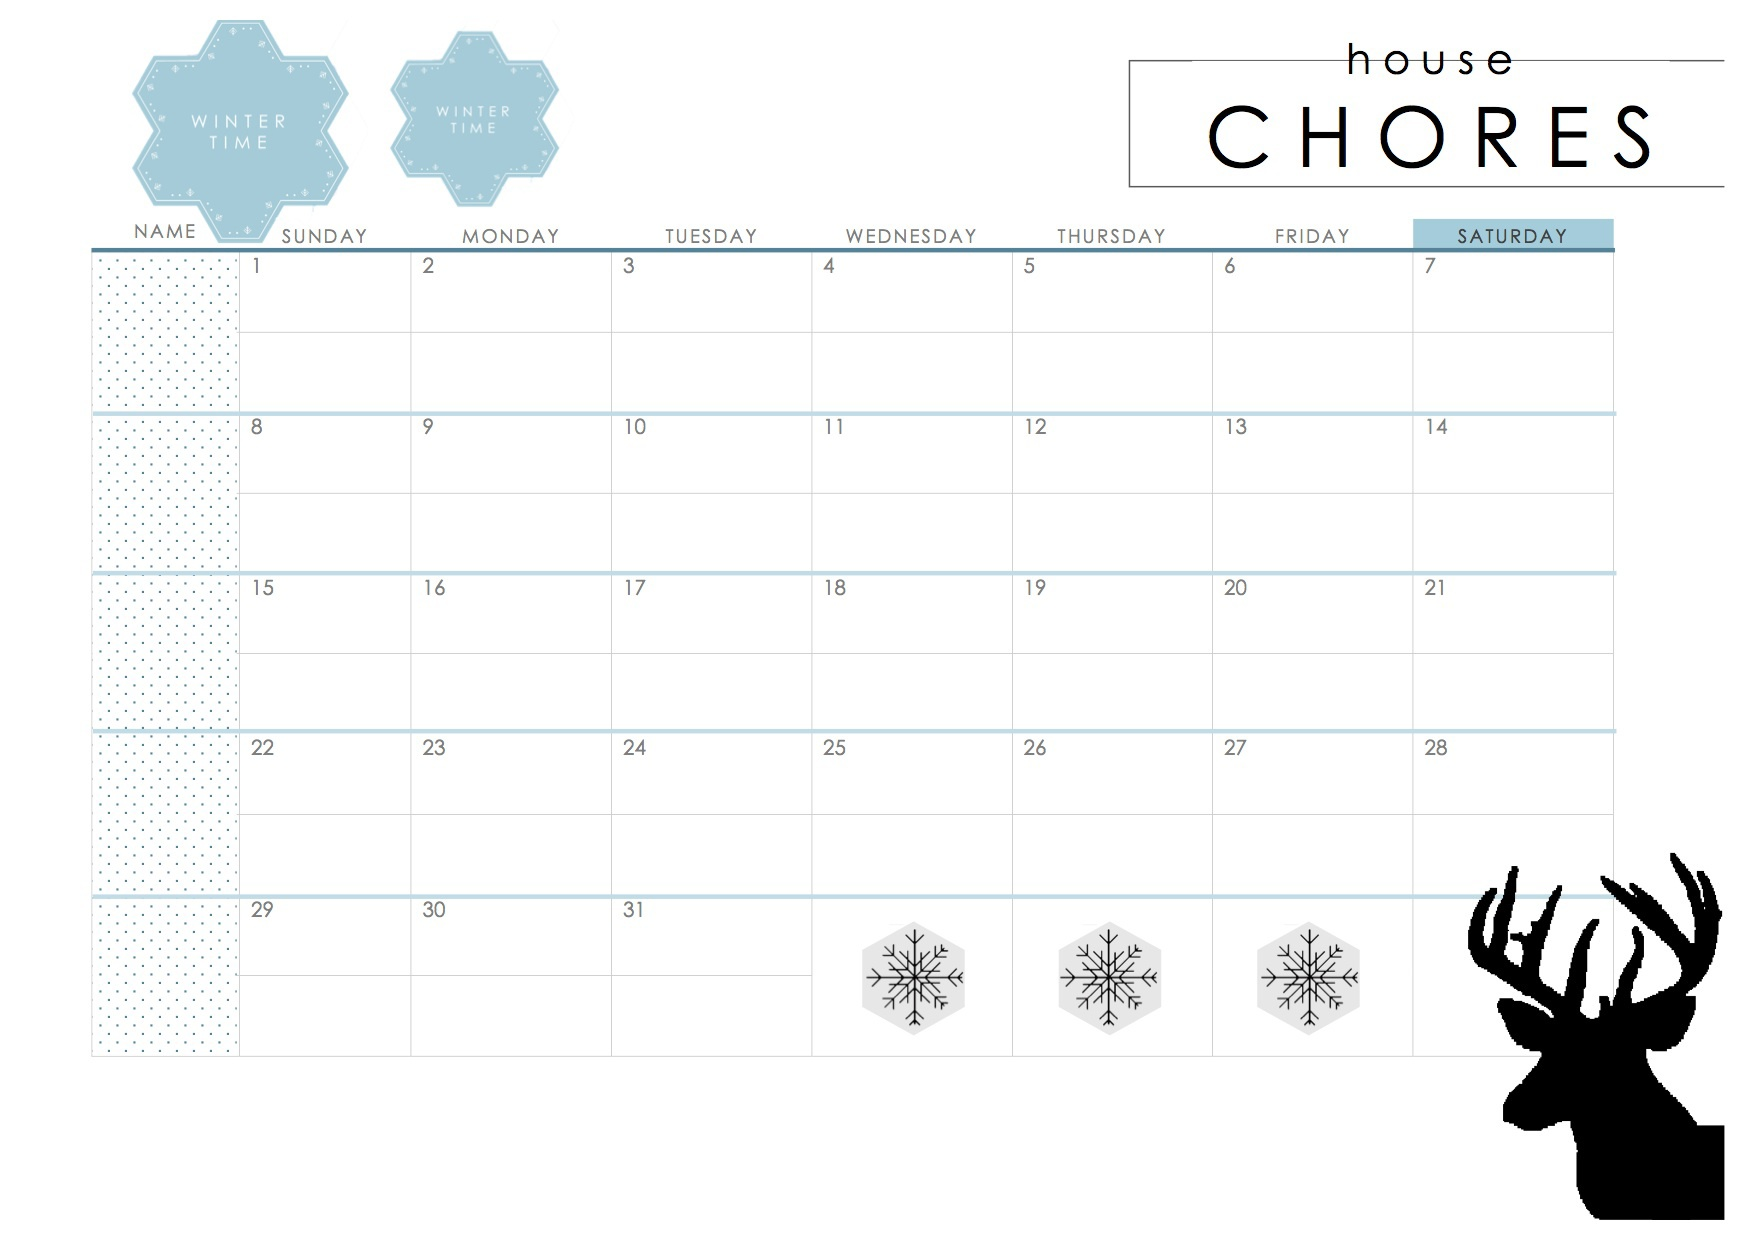 2013-12 - House chores.jpg